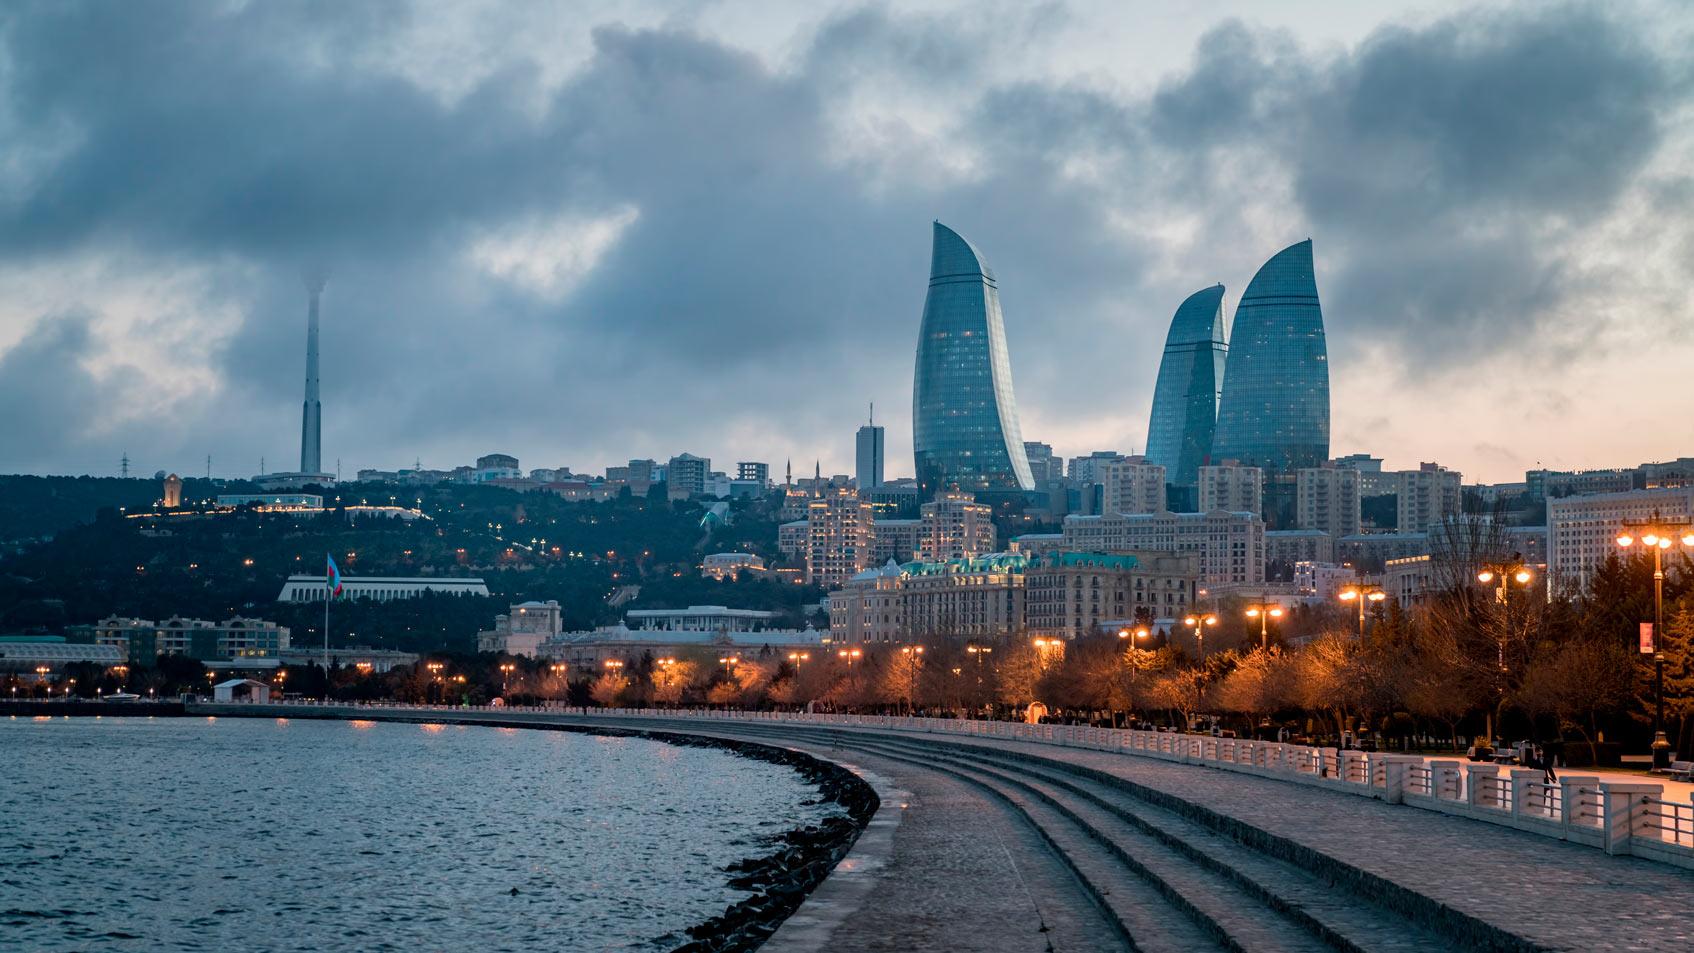 Баку современная архитектура